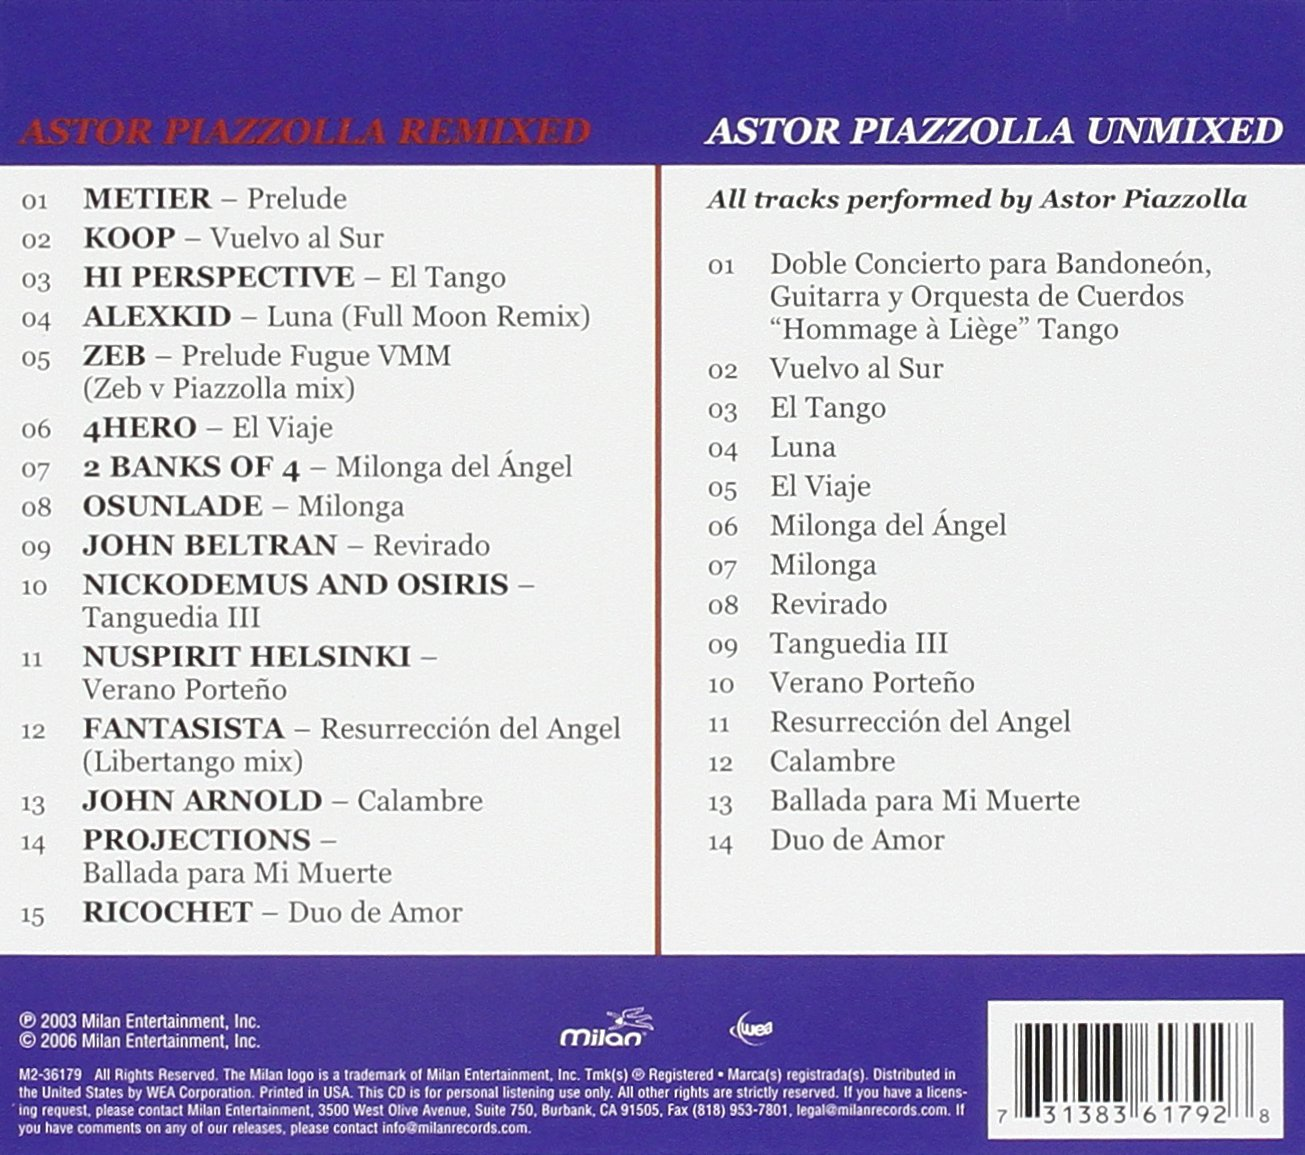 Remixed/Unmixed: Astor Piazzolla: Amazon.es: Música